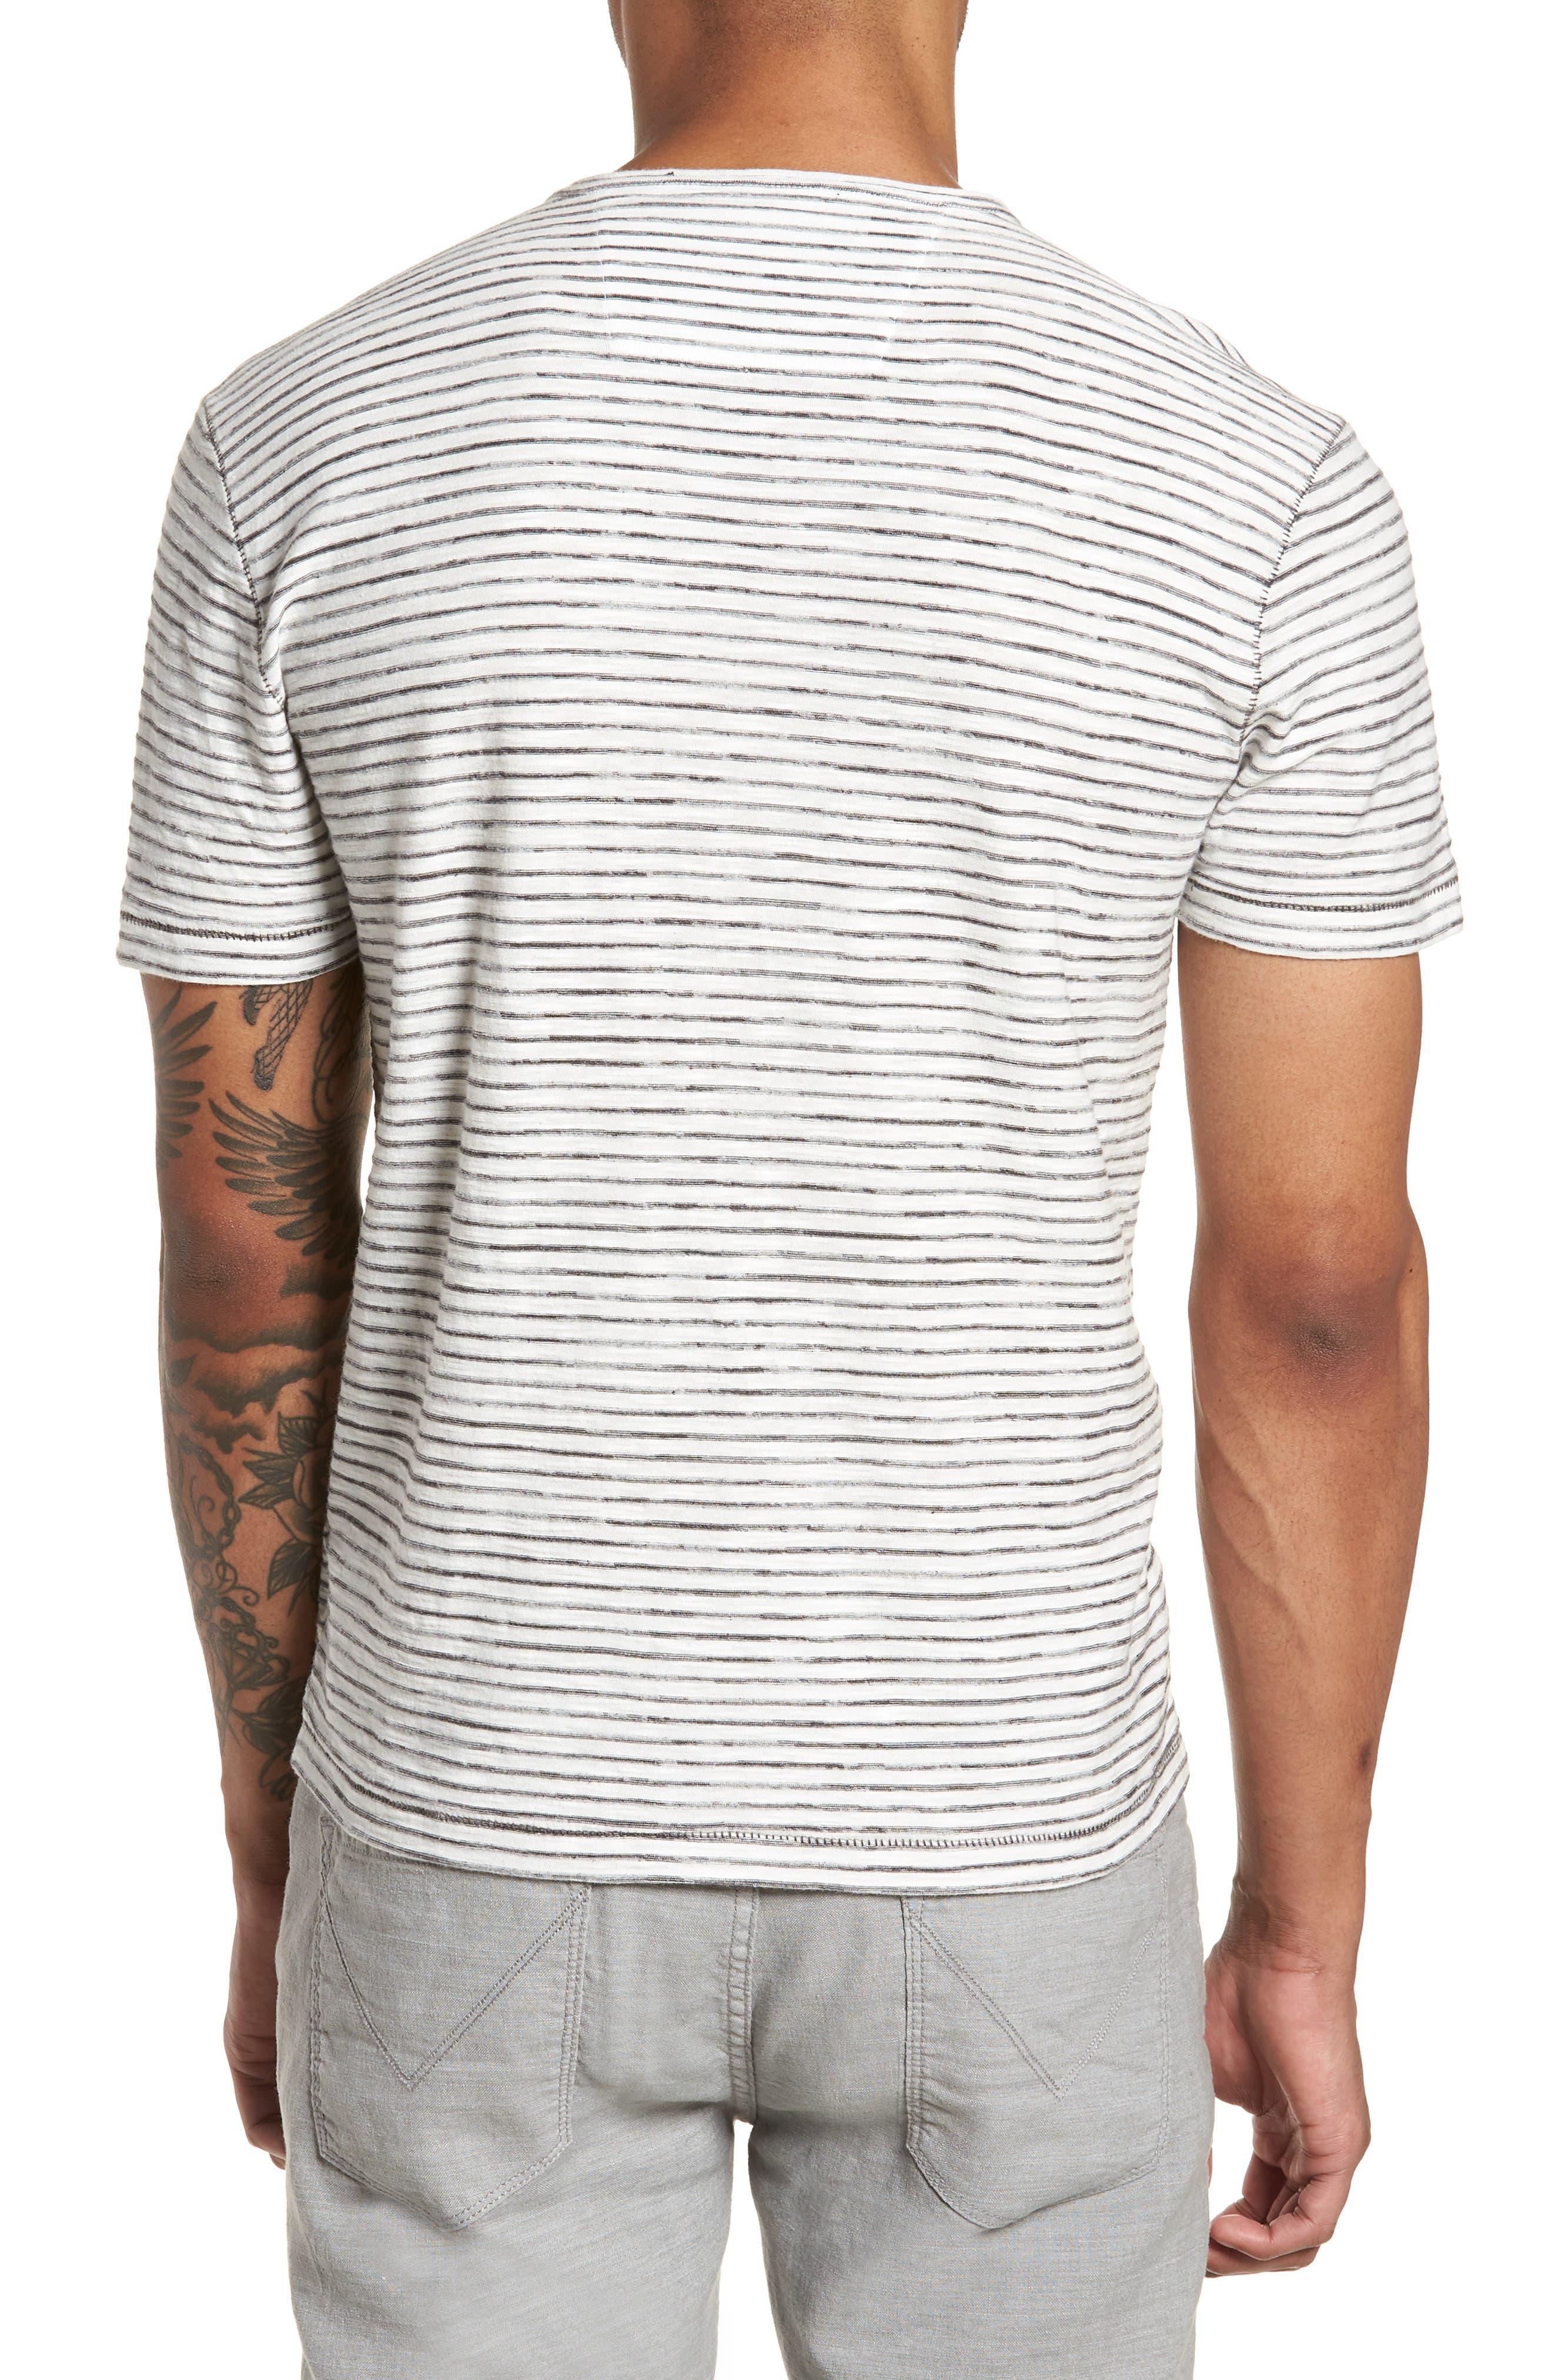 Slim Fit T-Shirt,                             Alternate thumbnail 2, color,                             White